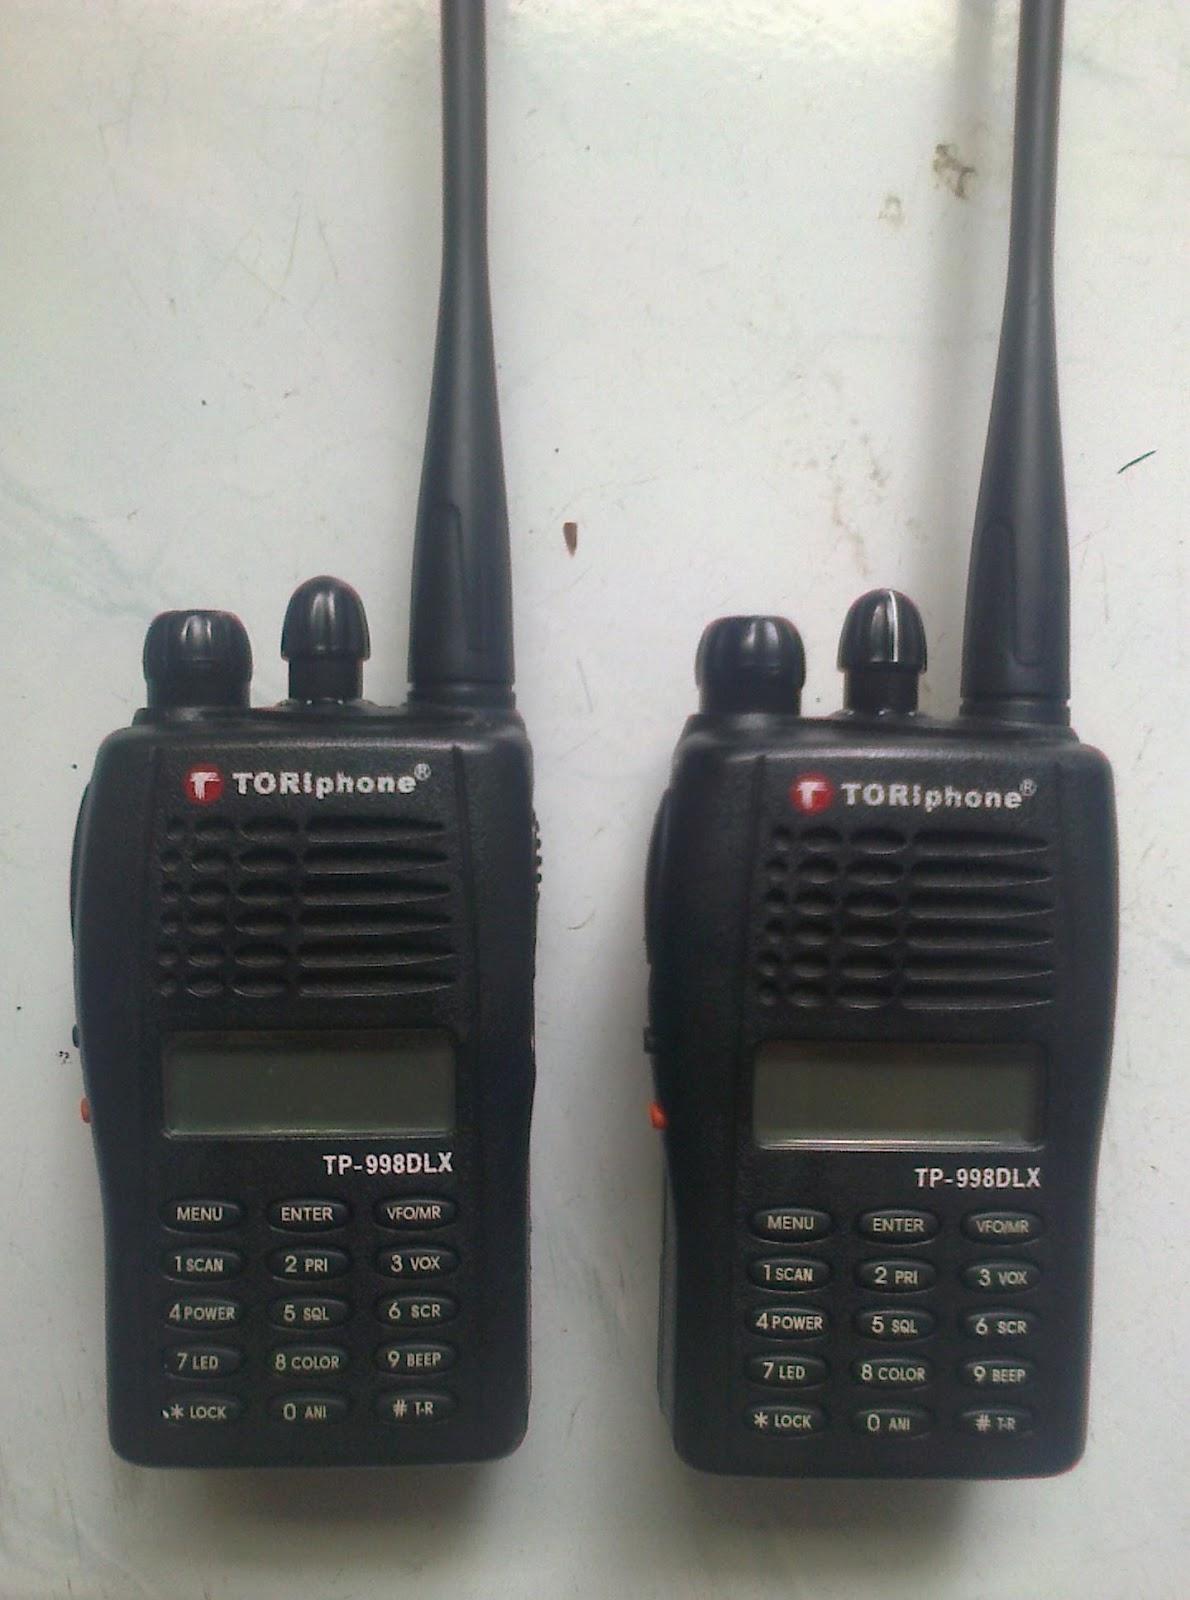 sewa handy talky, Sewa Handy Talky Serpong | Rental HT Serpong | Penyewaan Walkie Talkie Tangerang Sewa Toa Megaphone